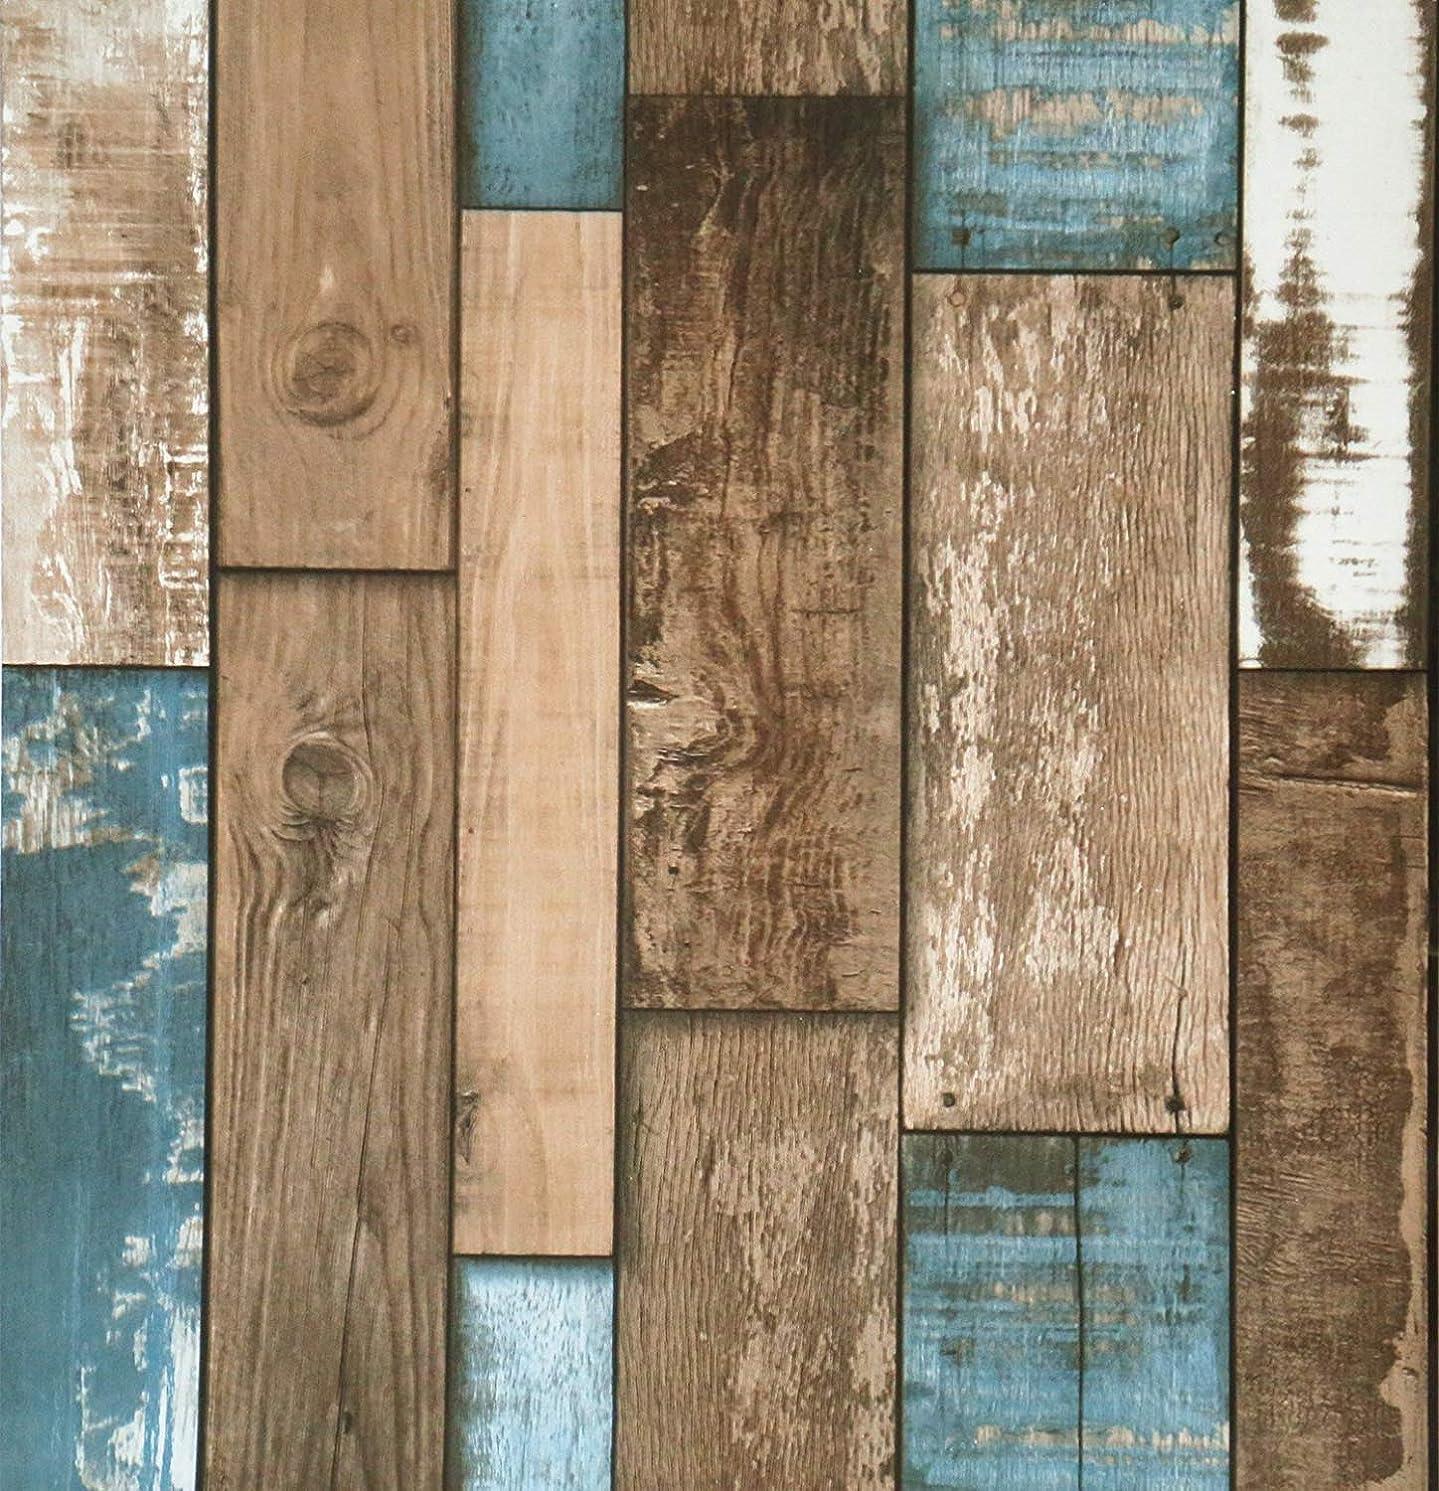 Vintage Peel and Stick Wood Wallpaper Self Adhesive for Furniture Kitchen Countertop Table Door DIY Chalkboard W17.7